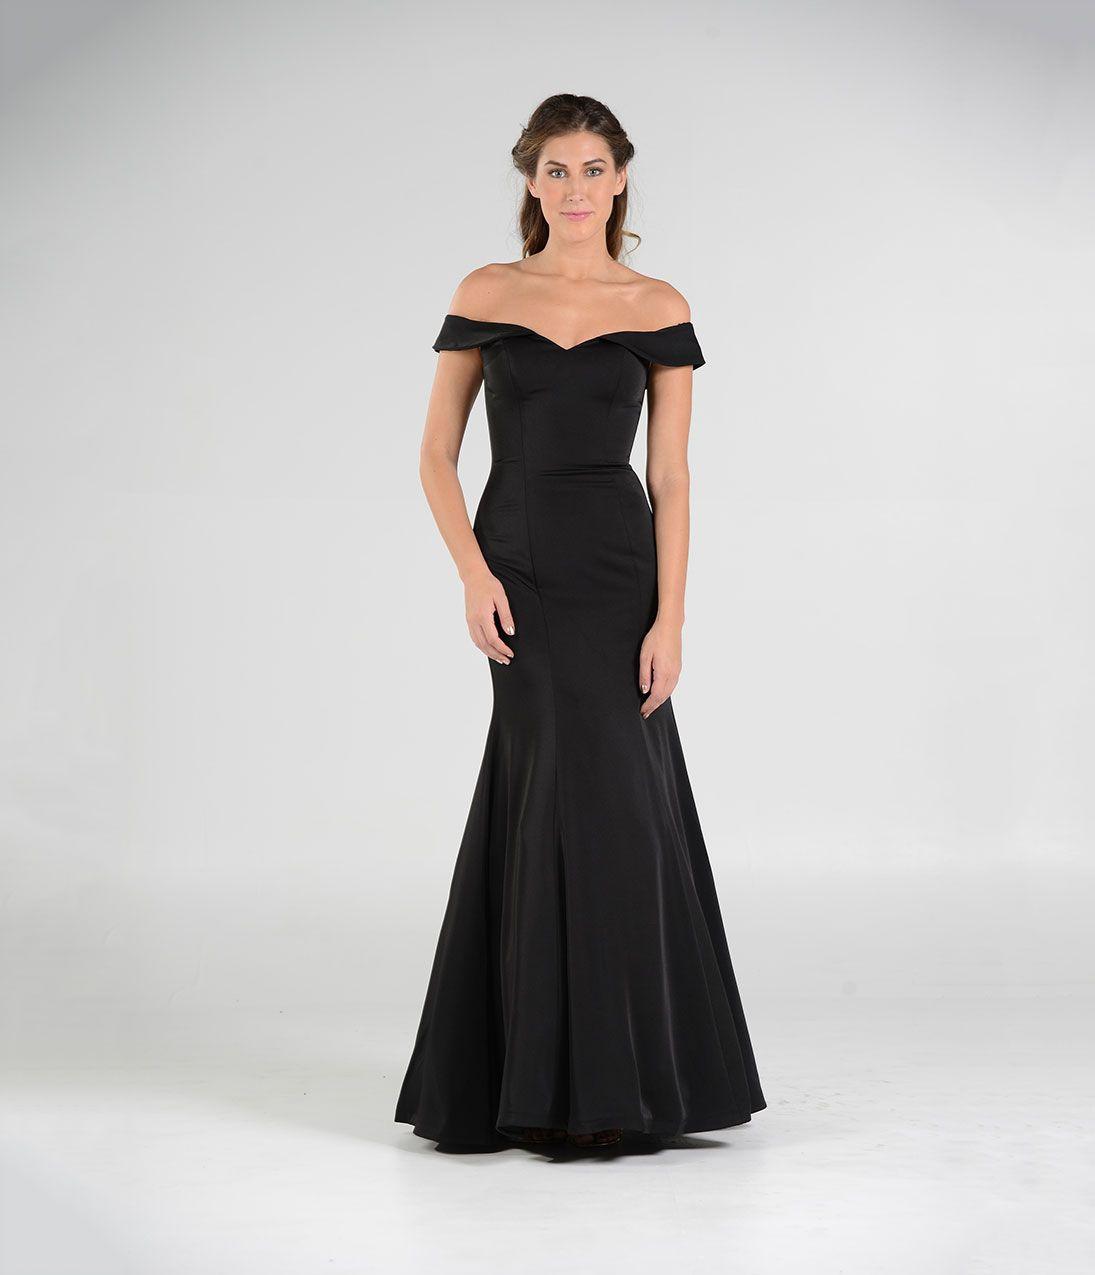 1940s Cocktail Dresses Party Dresses Black Strapless Off The Shoulder Dress 228 00 At Vintagedancer Com Gala Dresses Vintage Gowns Deco Dress [ 1275 x 1095 Pixel ]